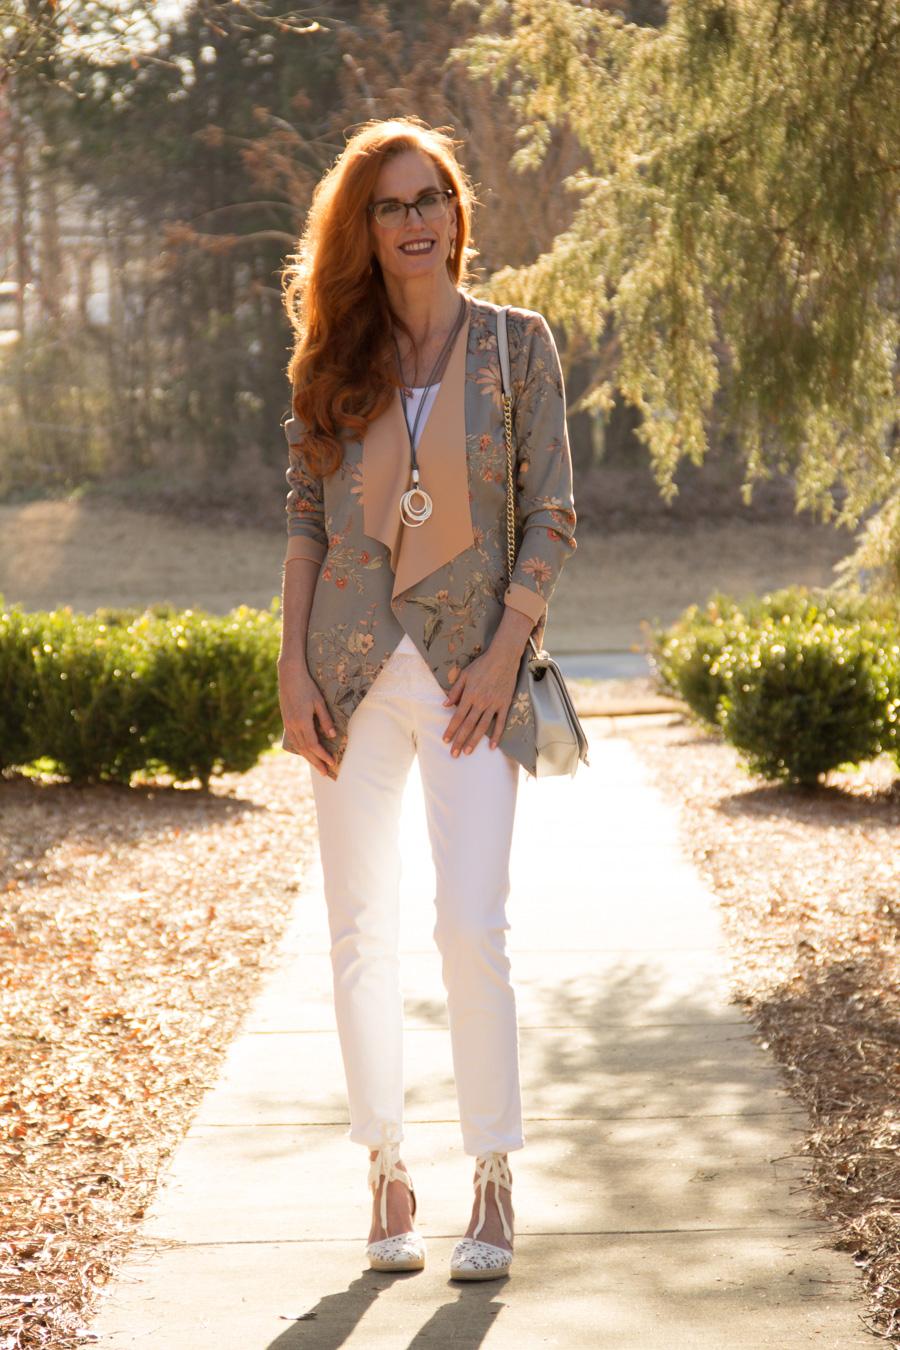 81df0ef968 Soft Surroundings- Soft Pastel Look for Spring - Elegantly Dressed ...